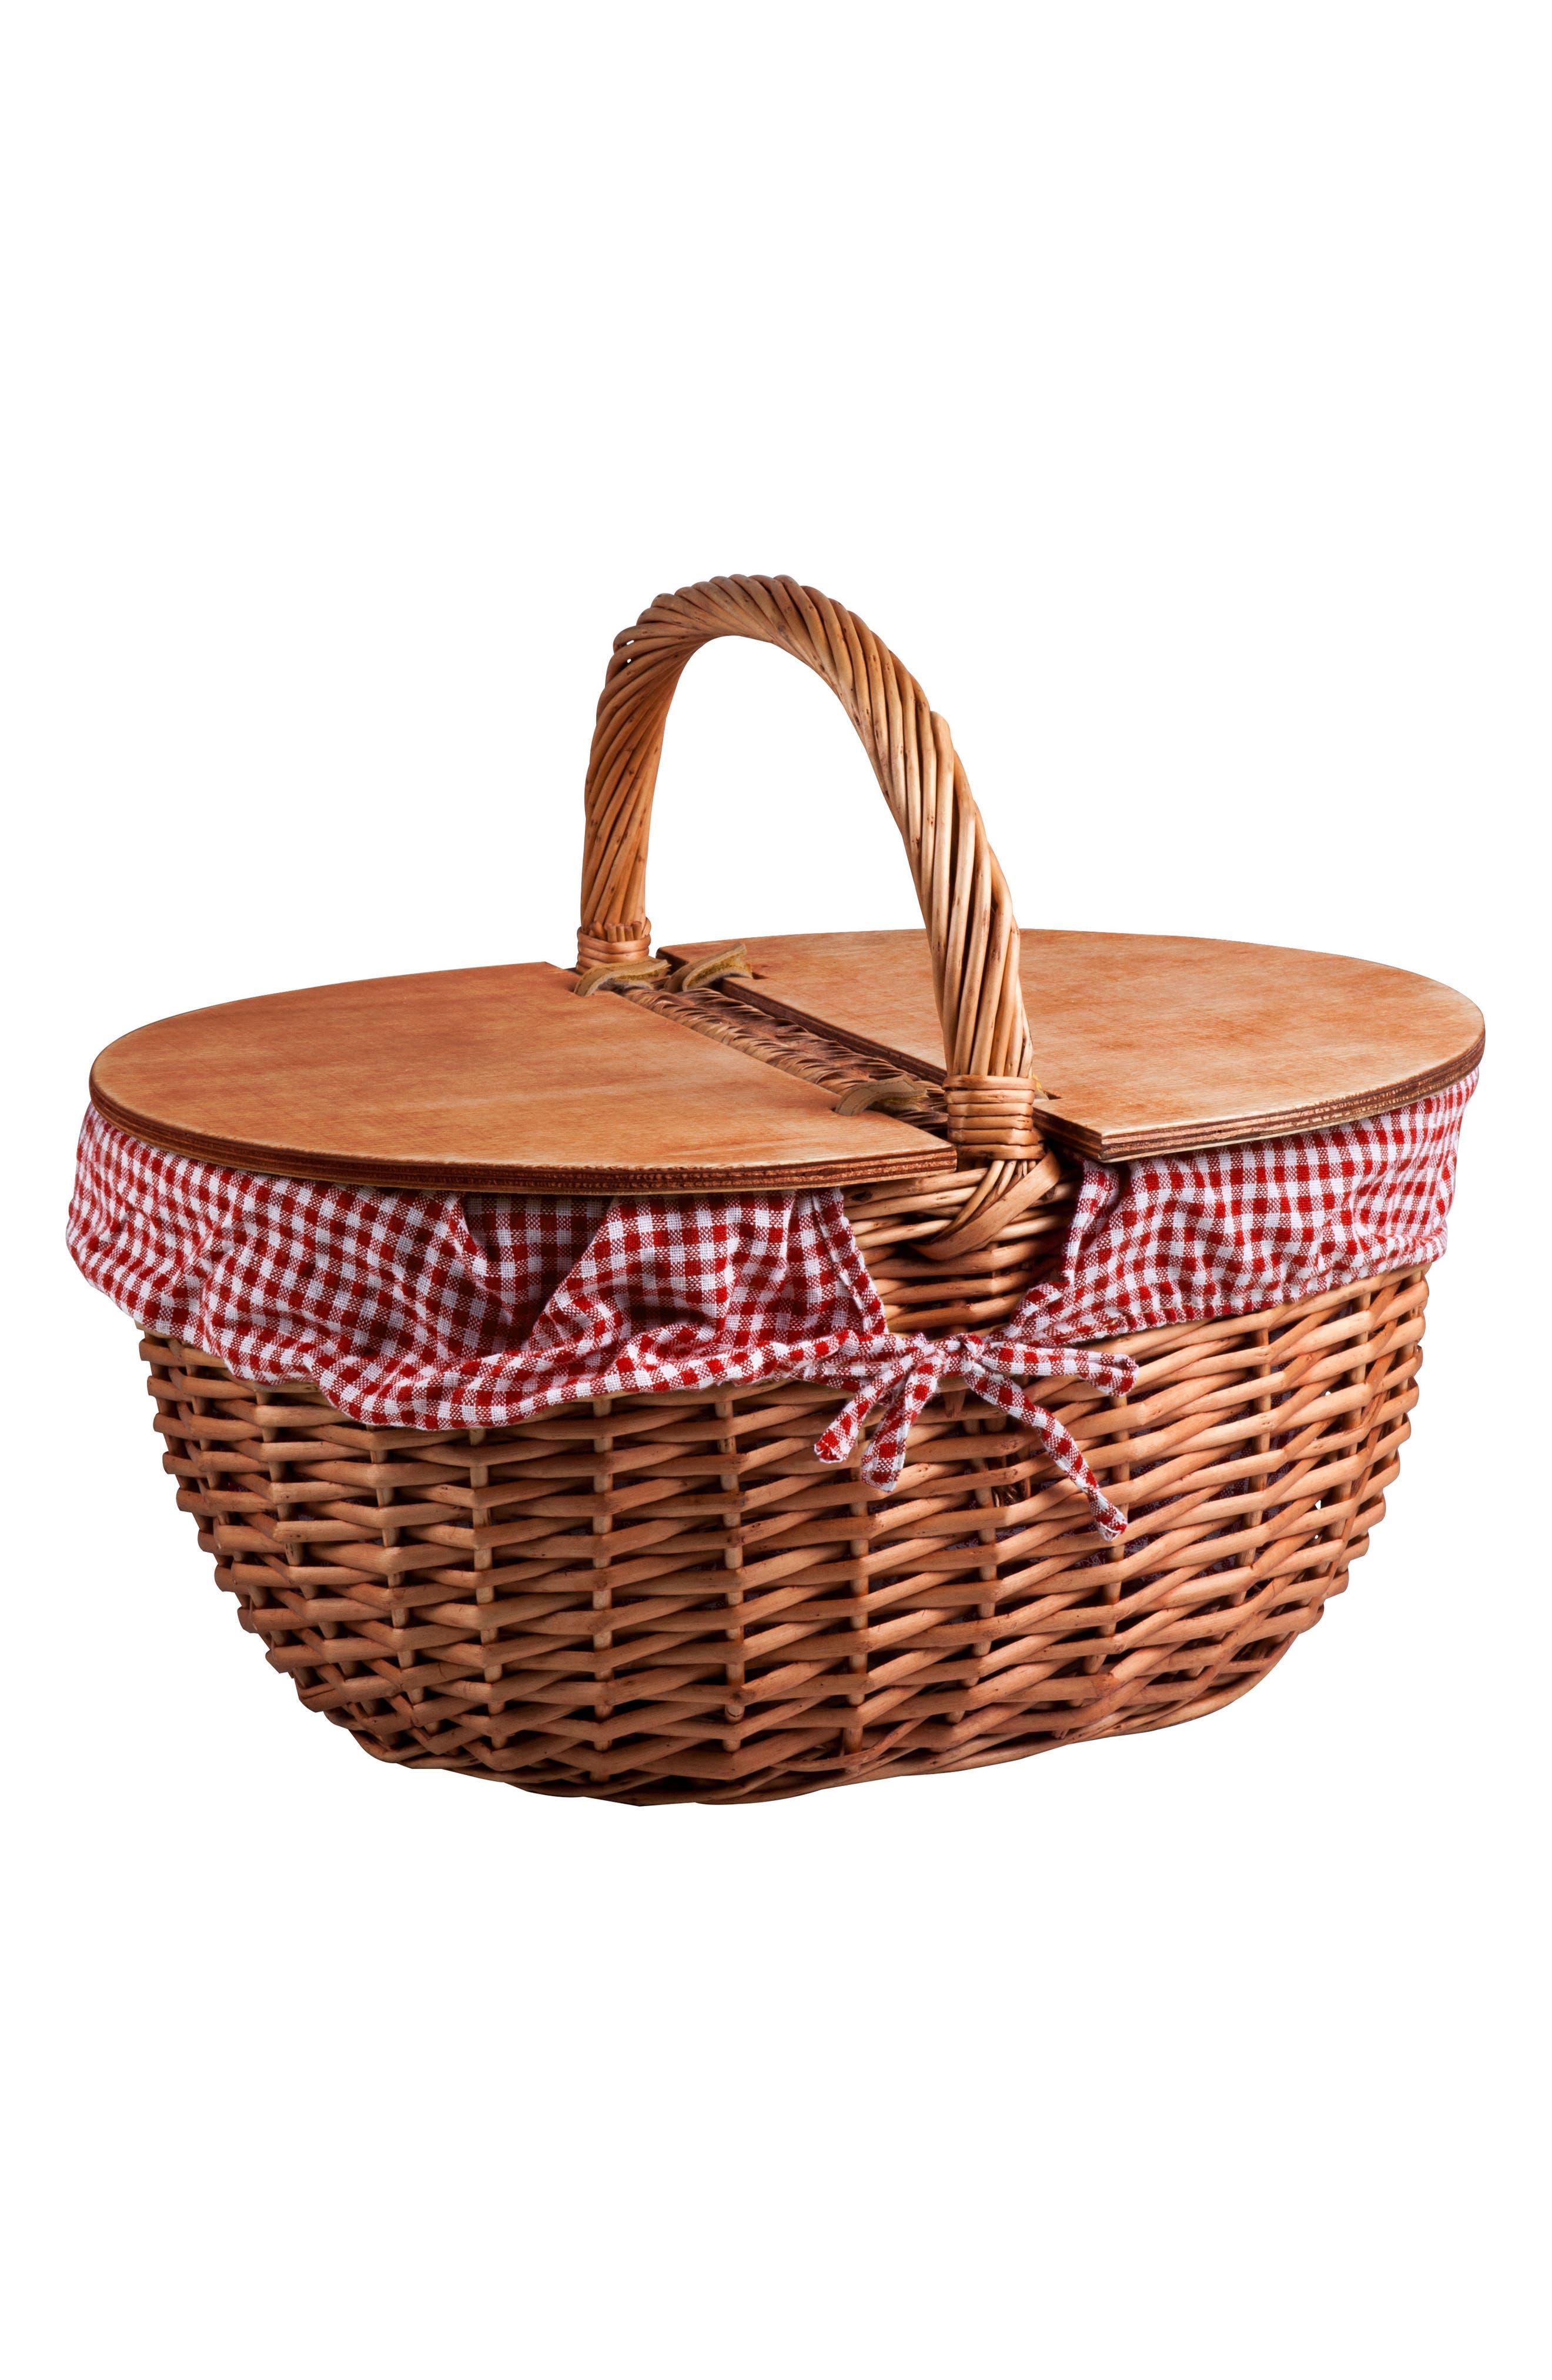 Country Wicker Picnic Basket,                             Main thumbnail 1, color,                             200